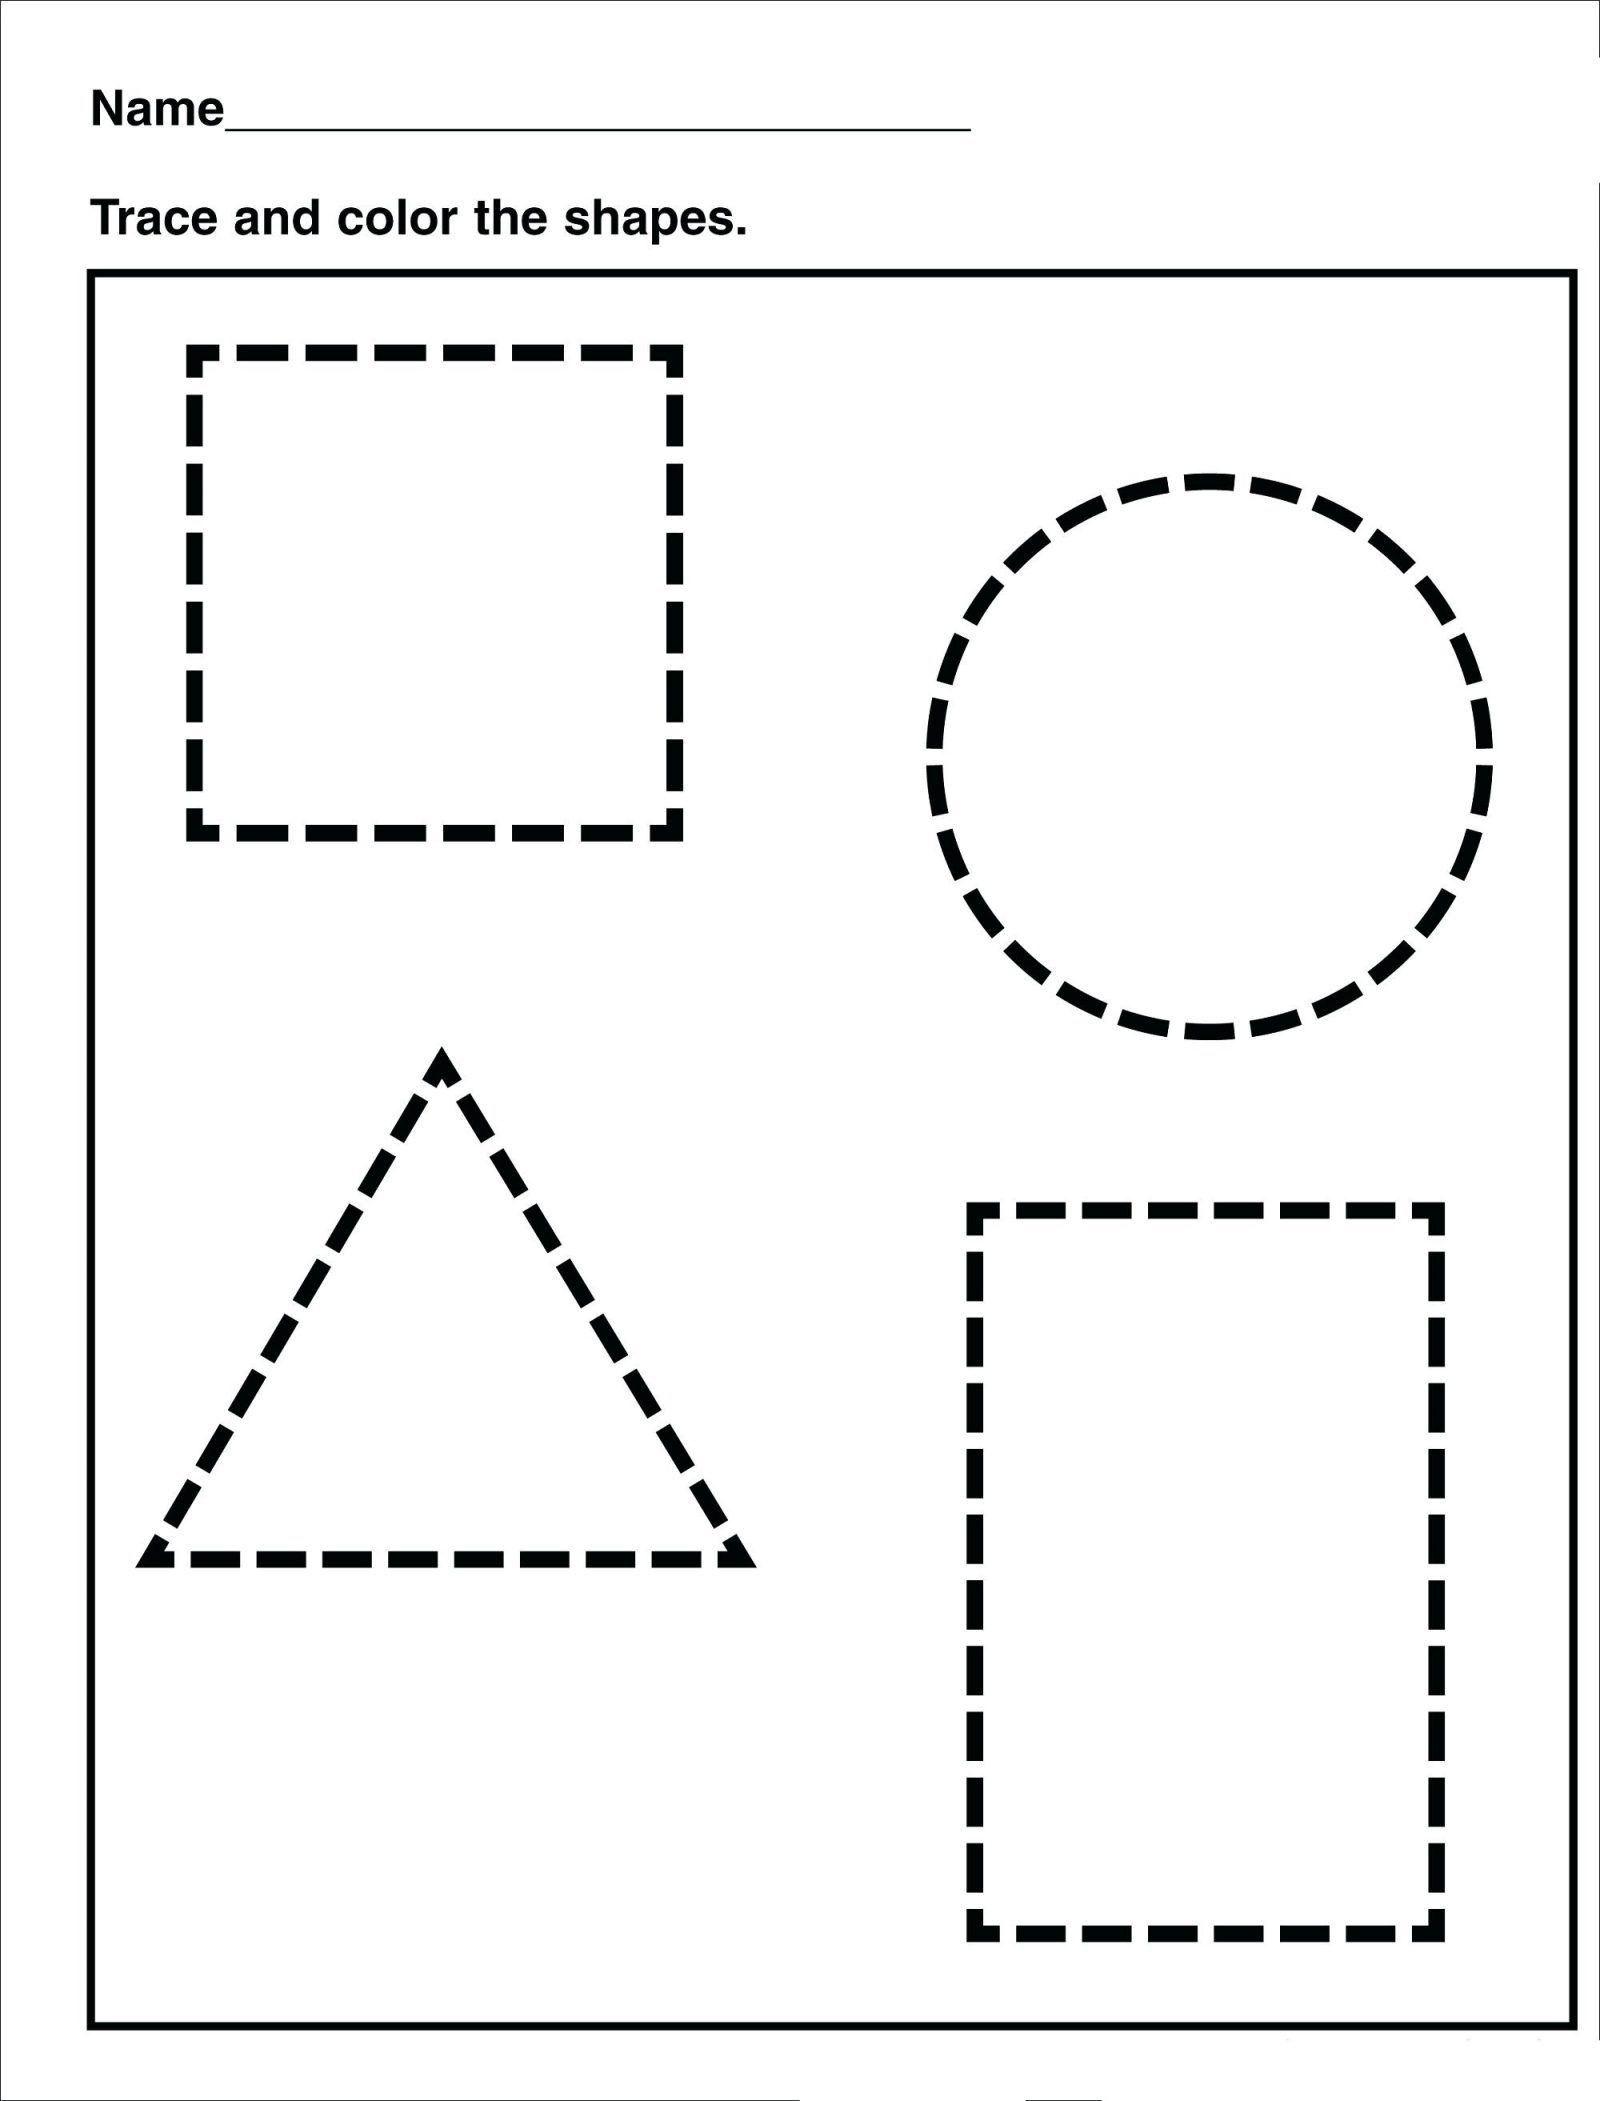 11 Shapes Preschool Tracing Worksheets Workhardtrainharder